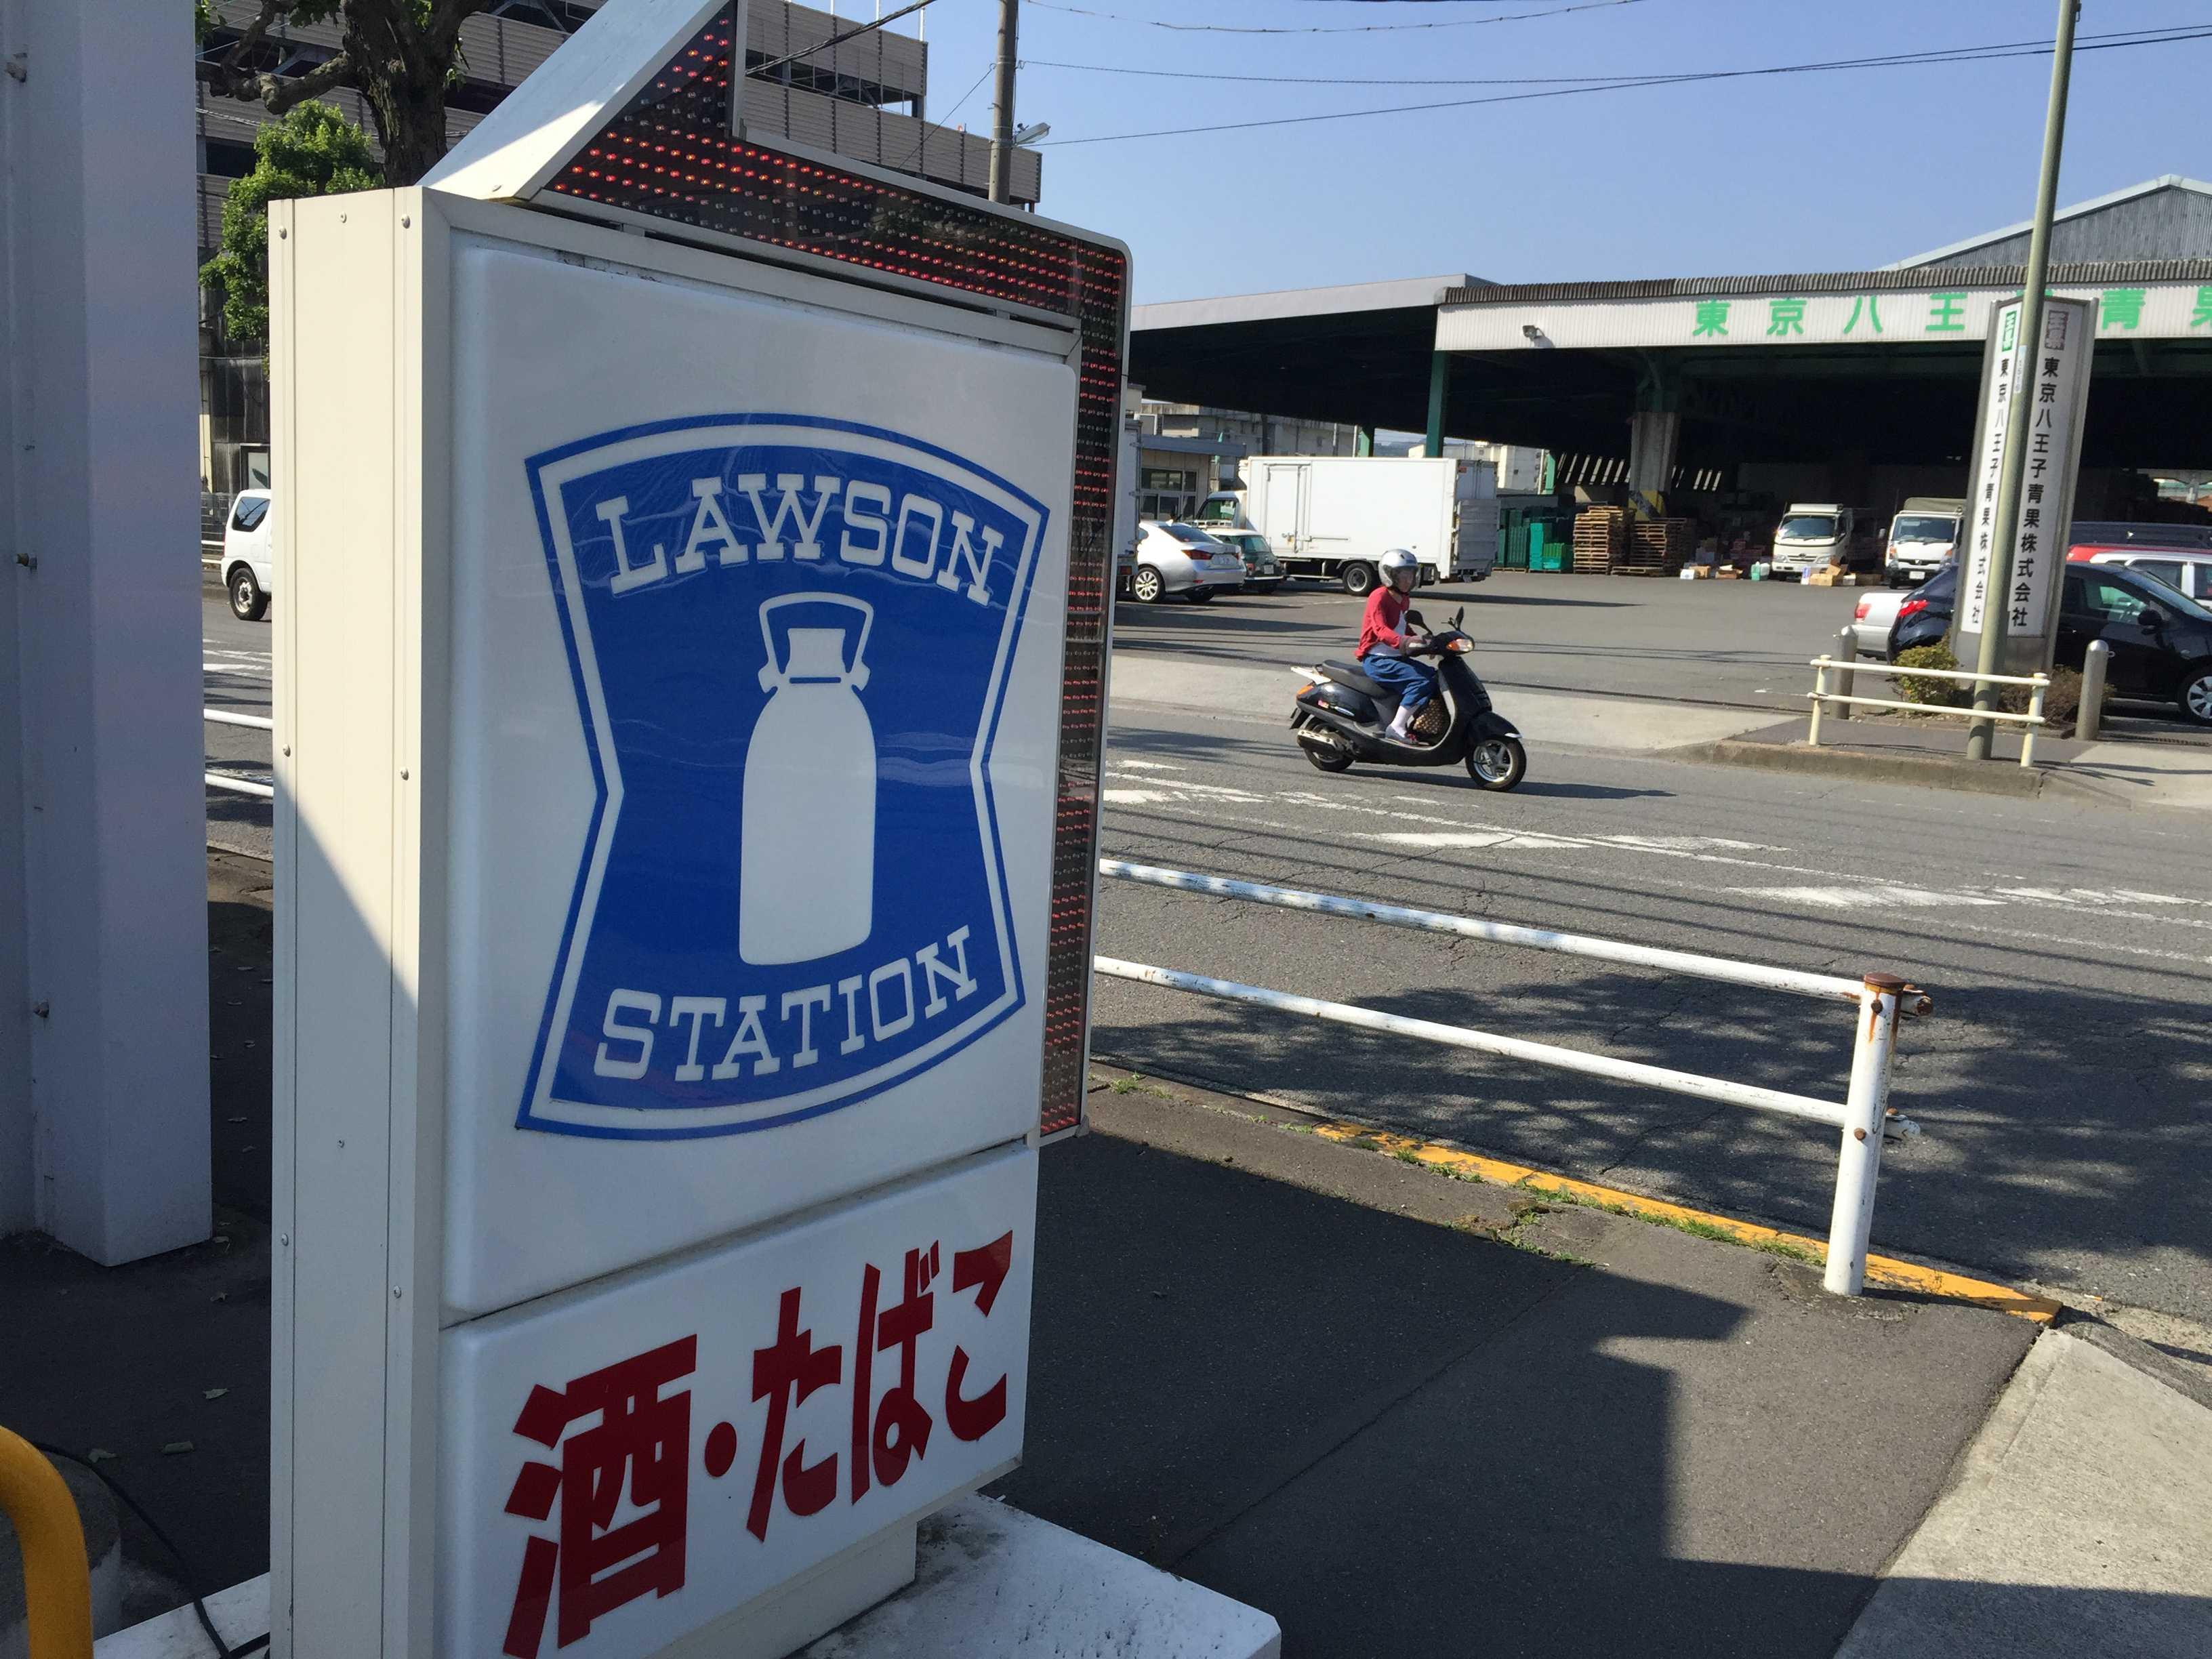 LAWSON STATION - ローソンの電飾看板